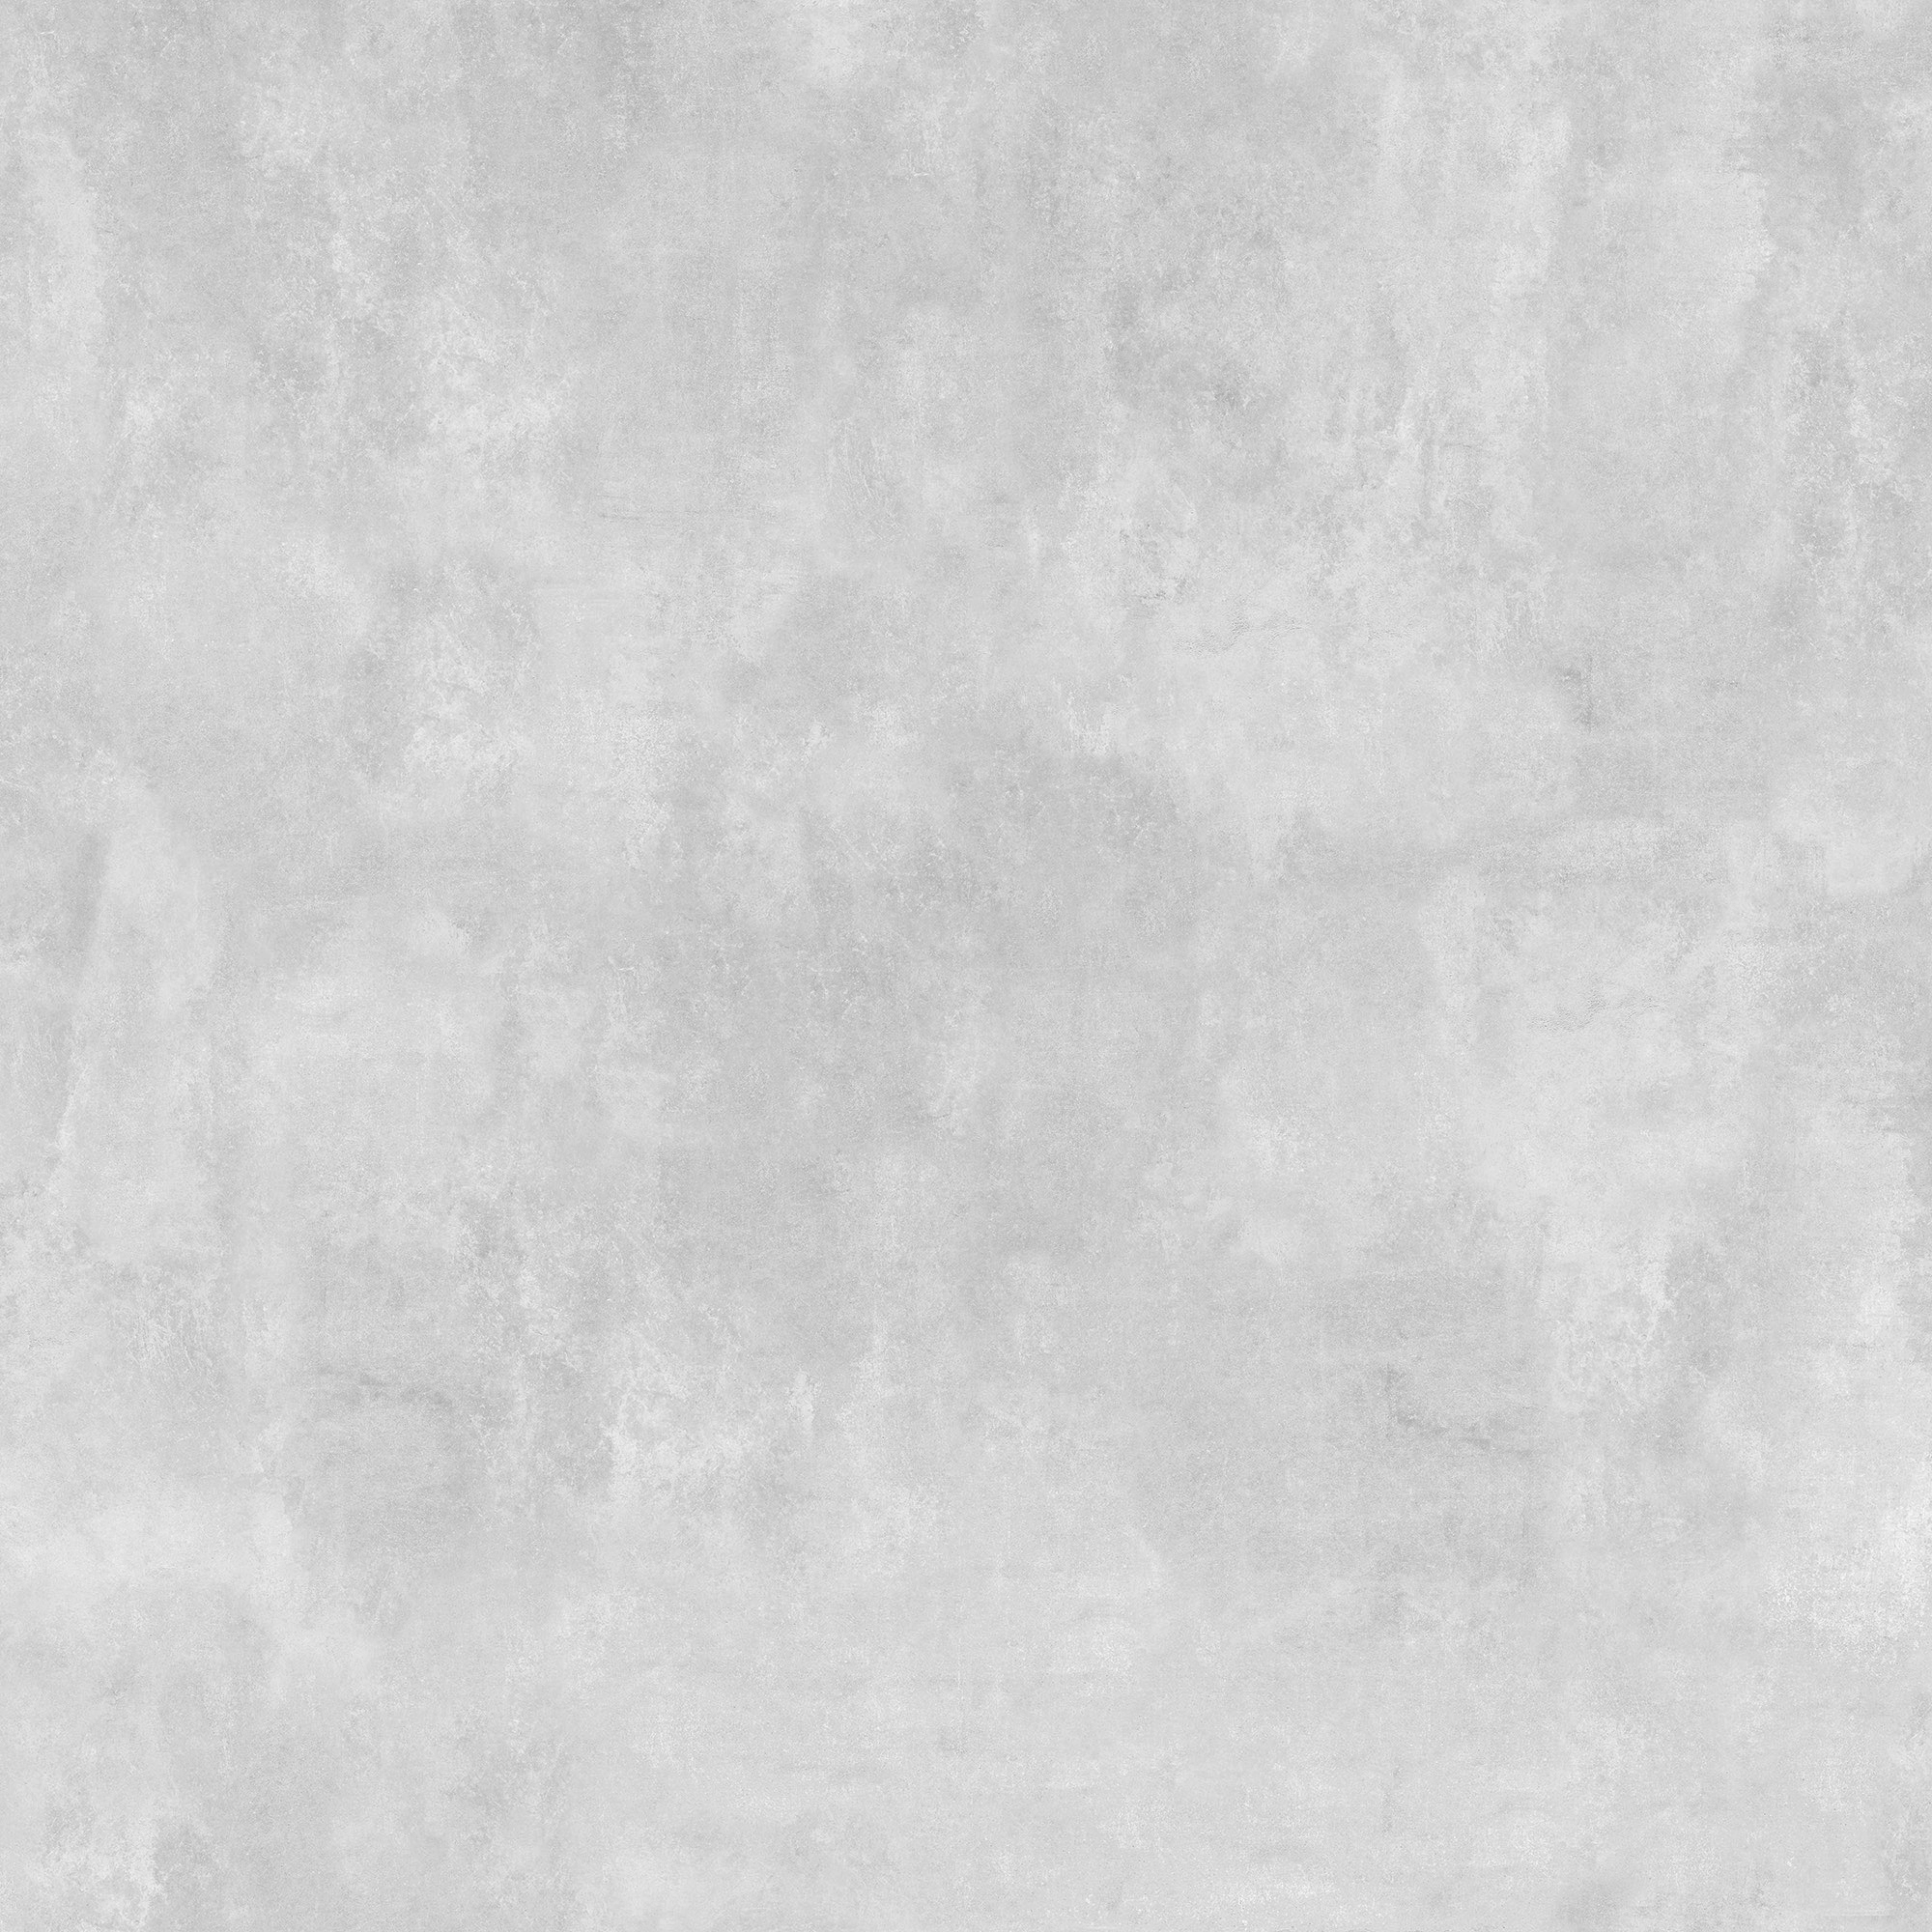 Master Soft Concret 120x120